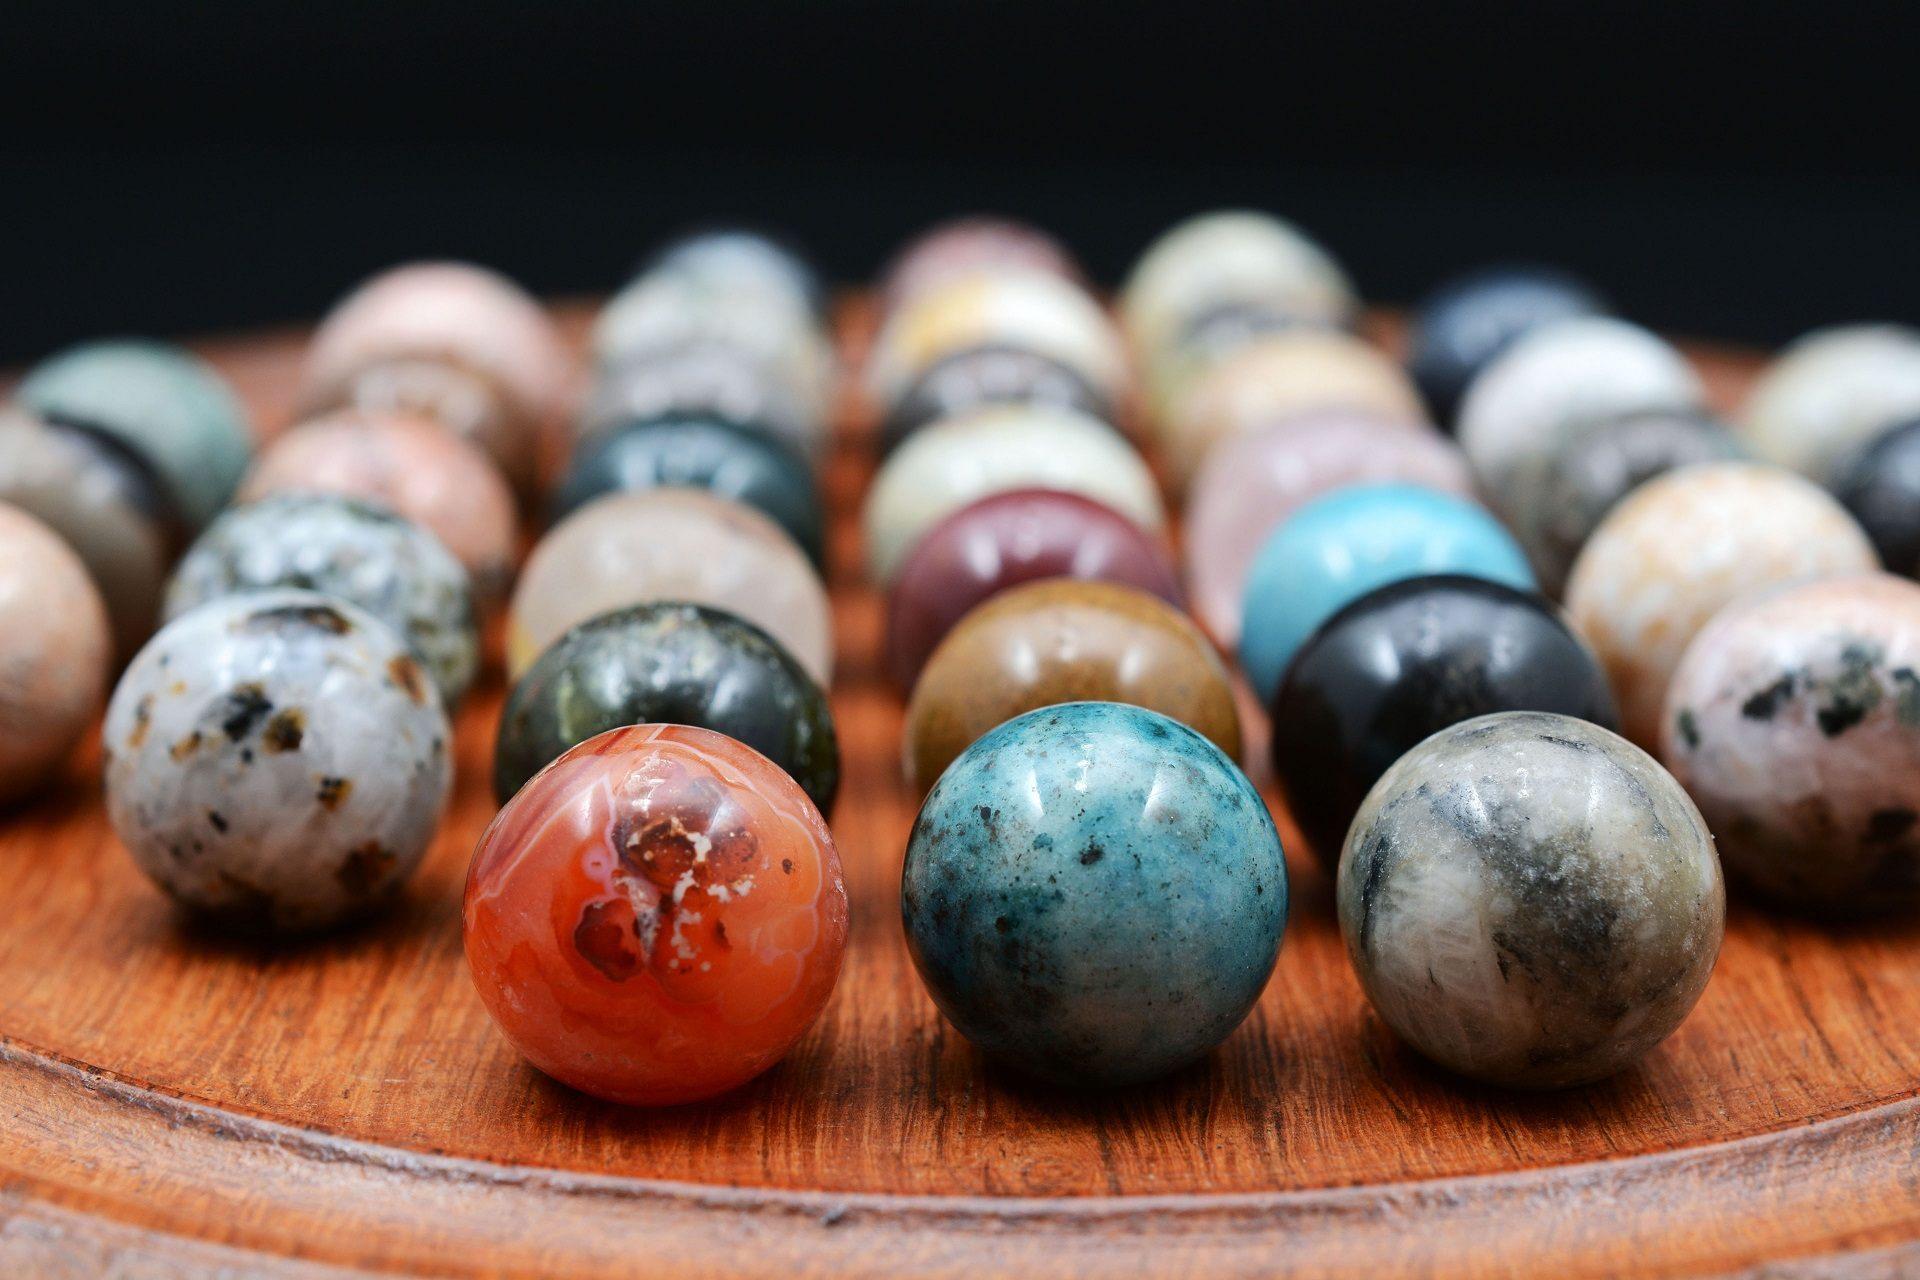 Marble(s)